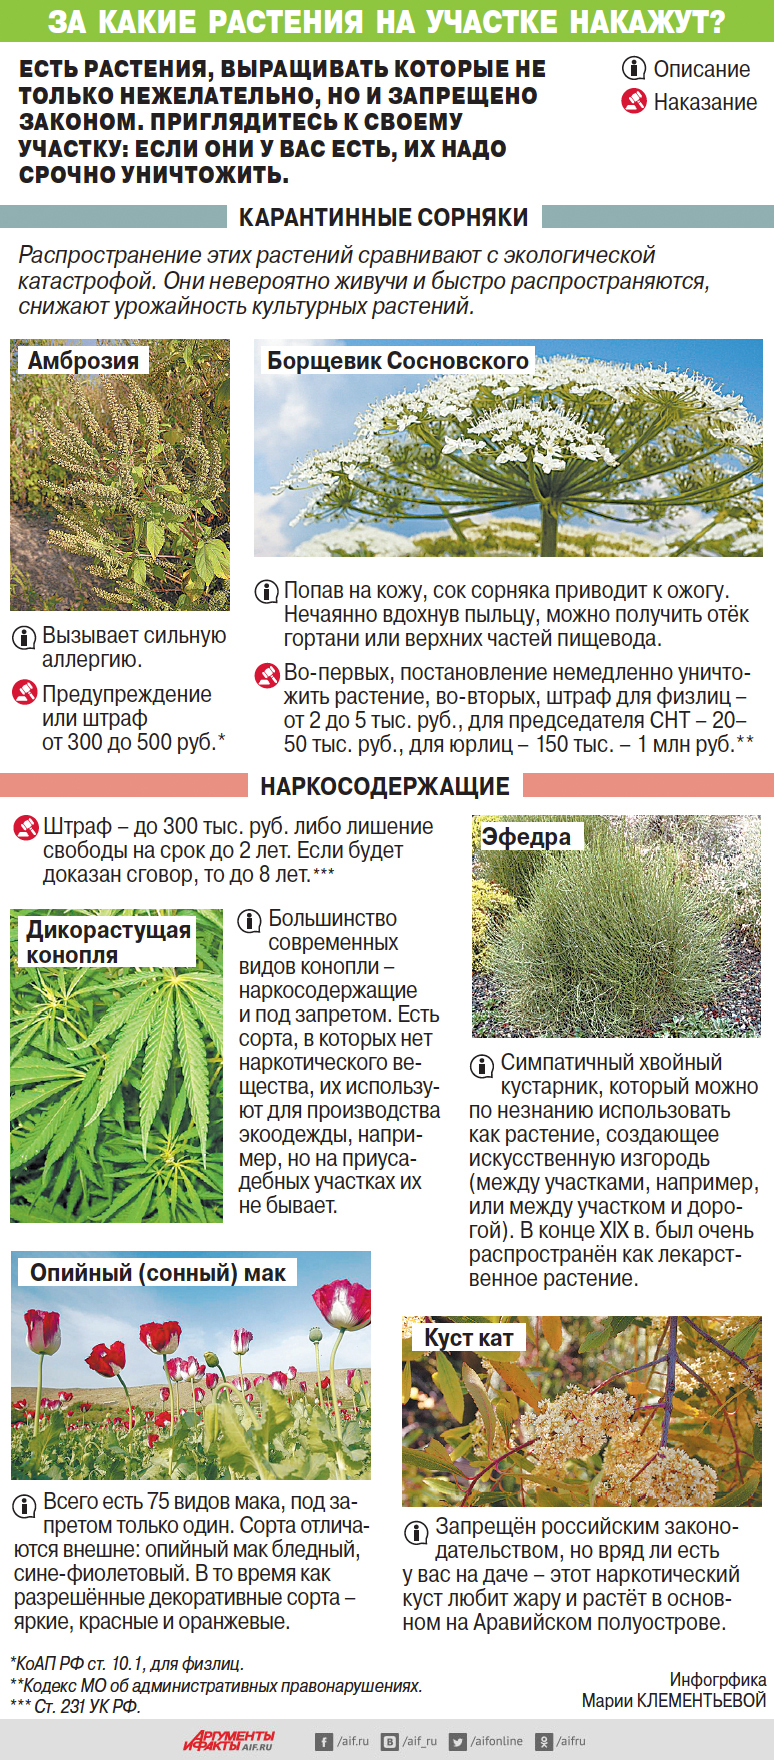 За какие растения на участке накажут?